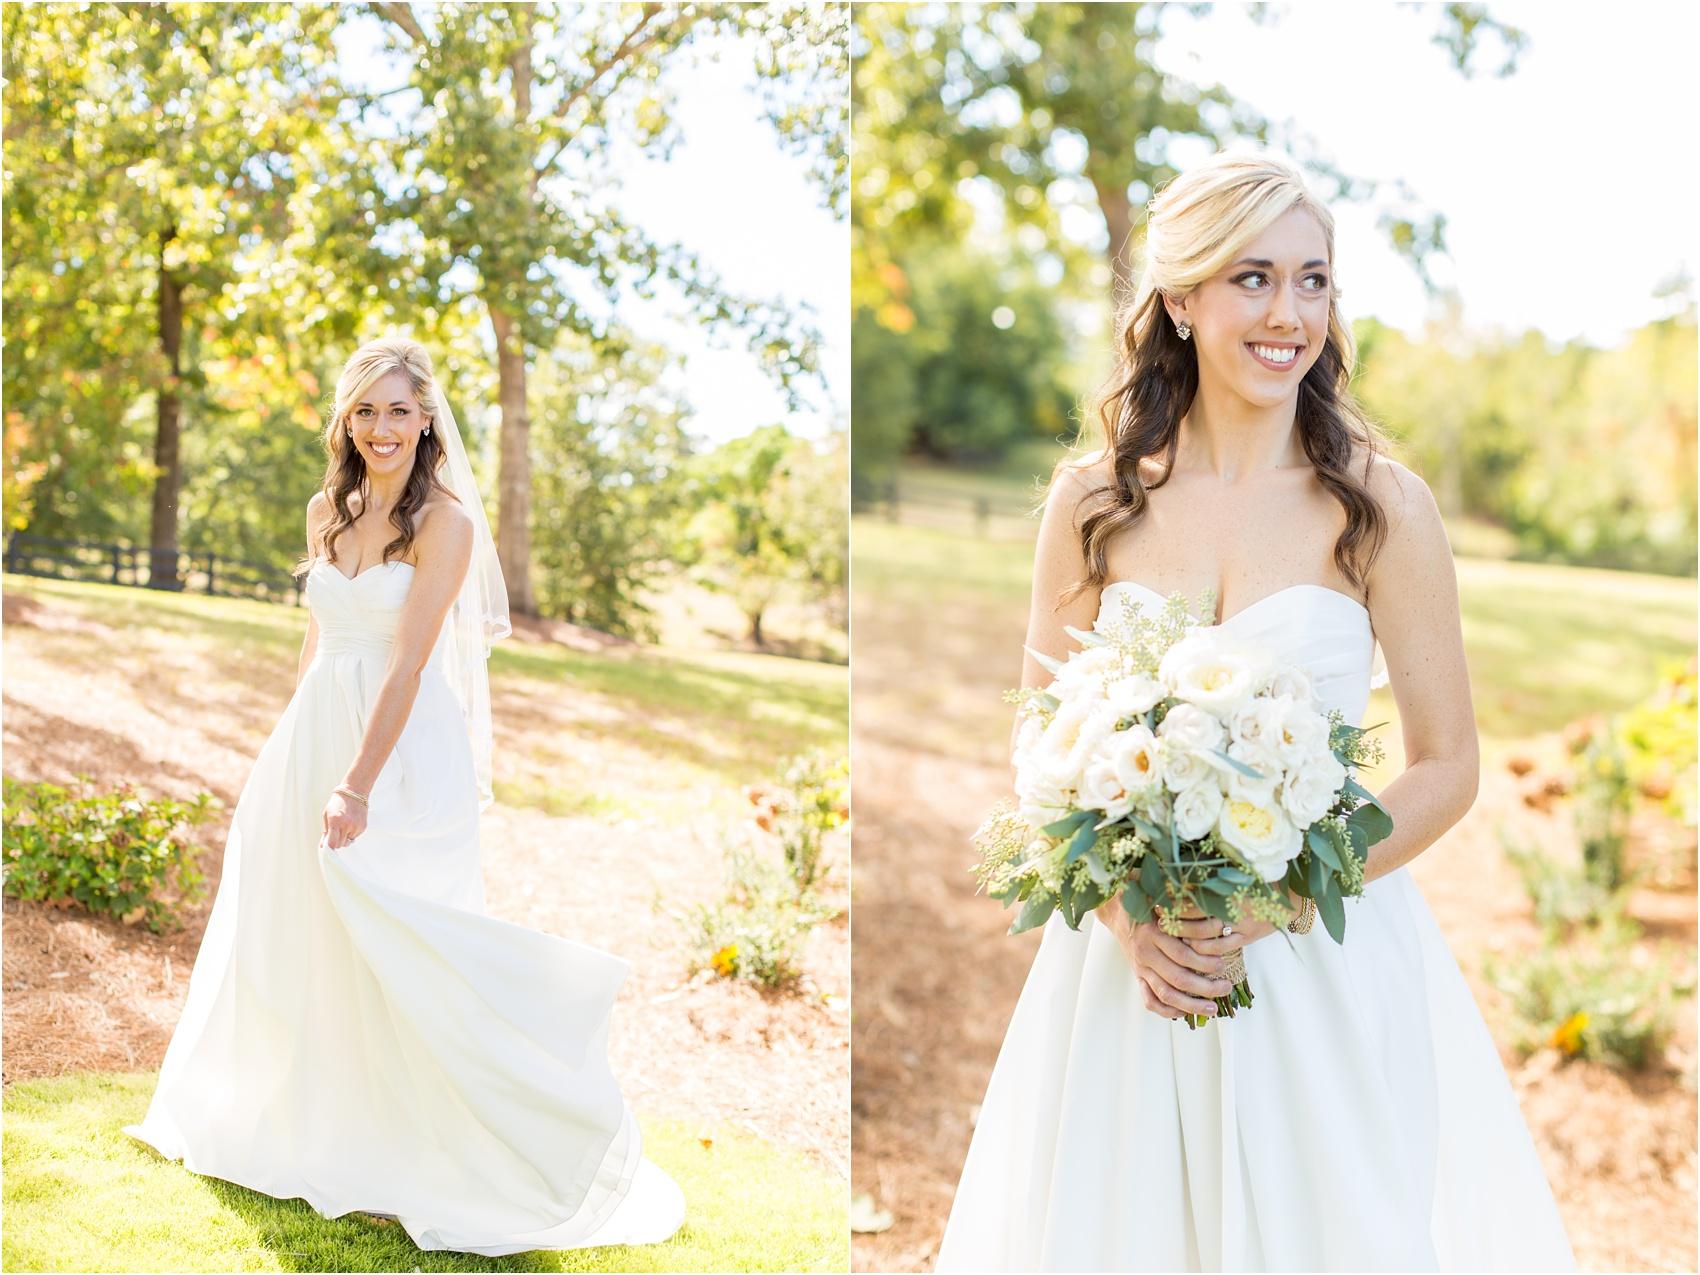 Savannah Eve Photography- Spencer Wedding- Blog-2.jpg